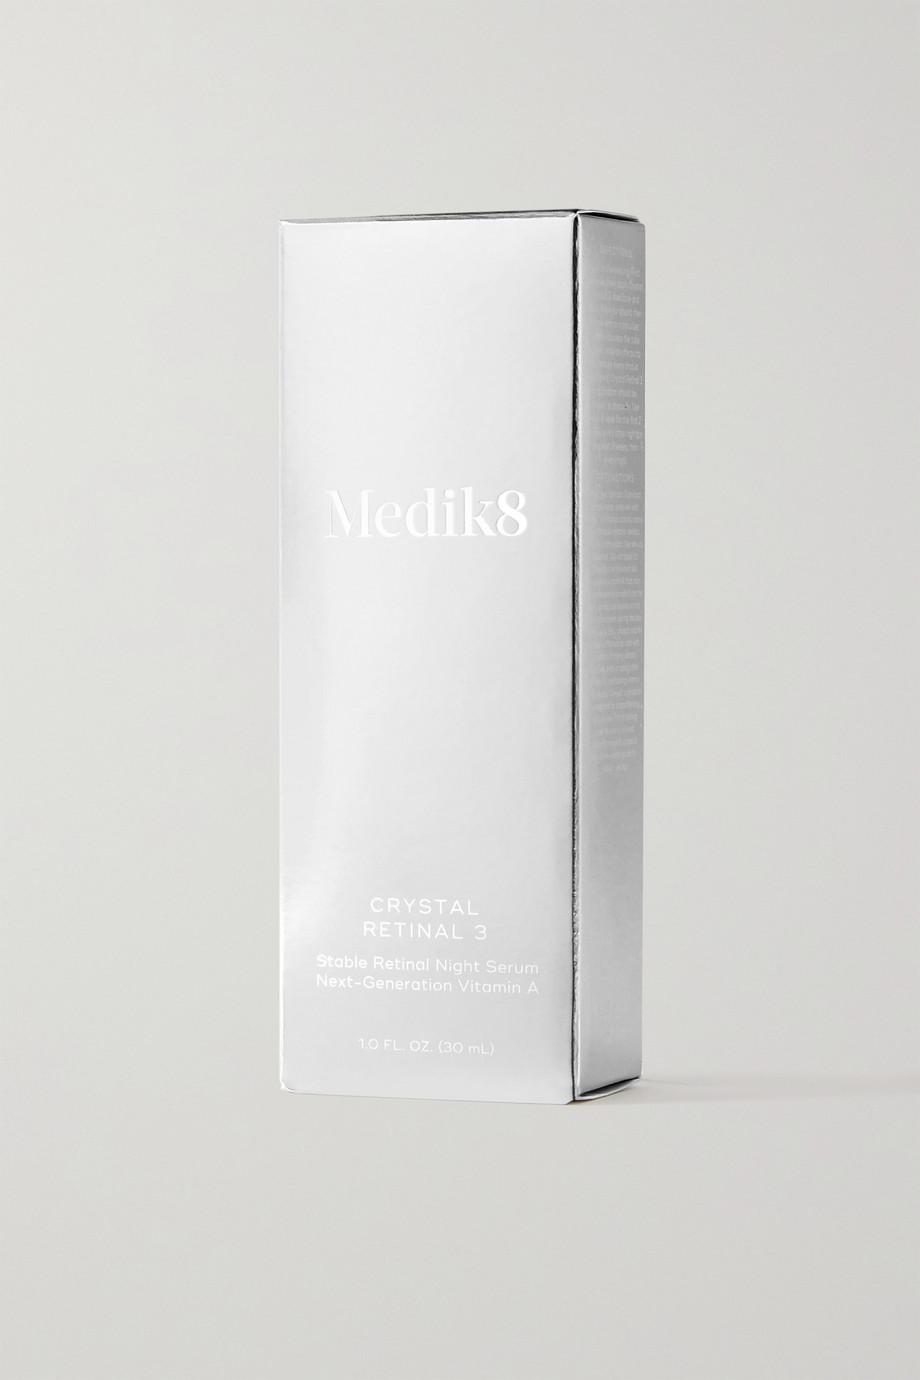 Medik8 Crystal Retinal 3™ Stable Retinal Night Serum, 30 ml – Nachtserum